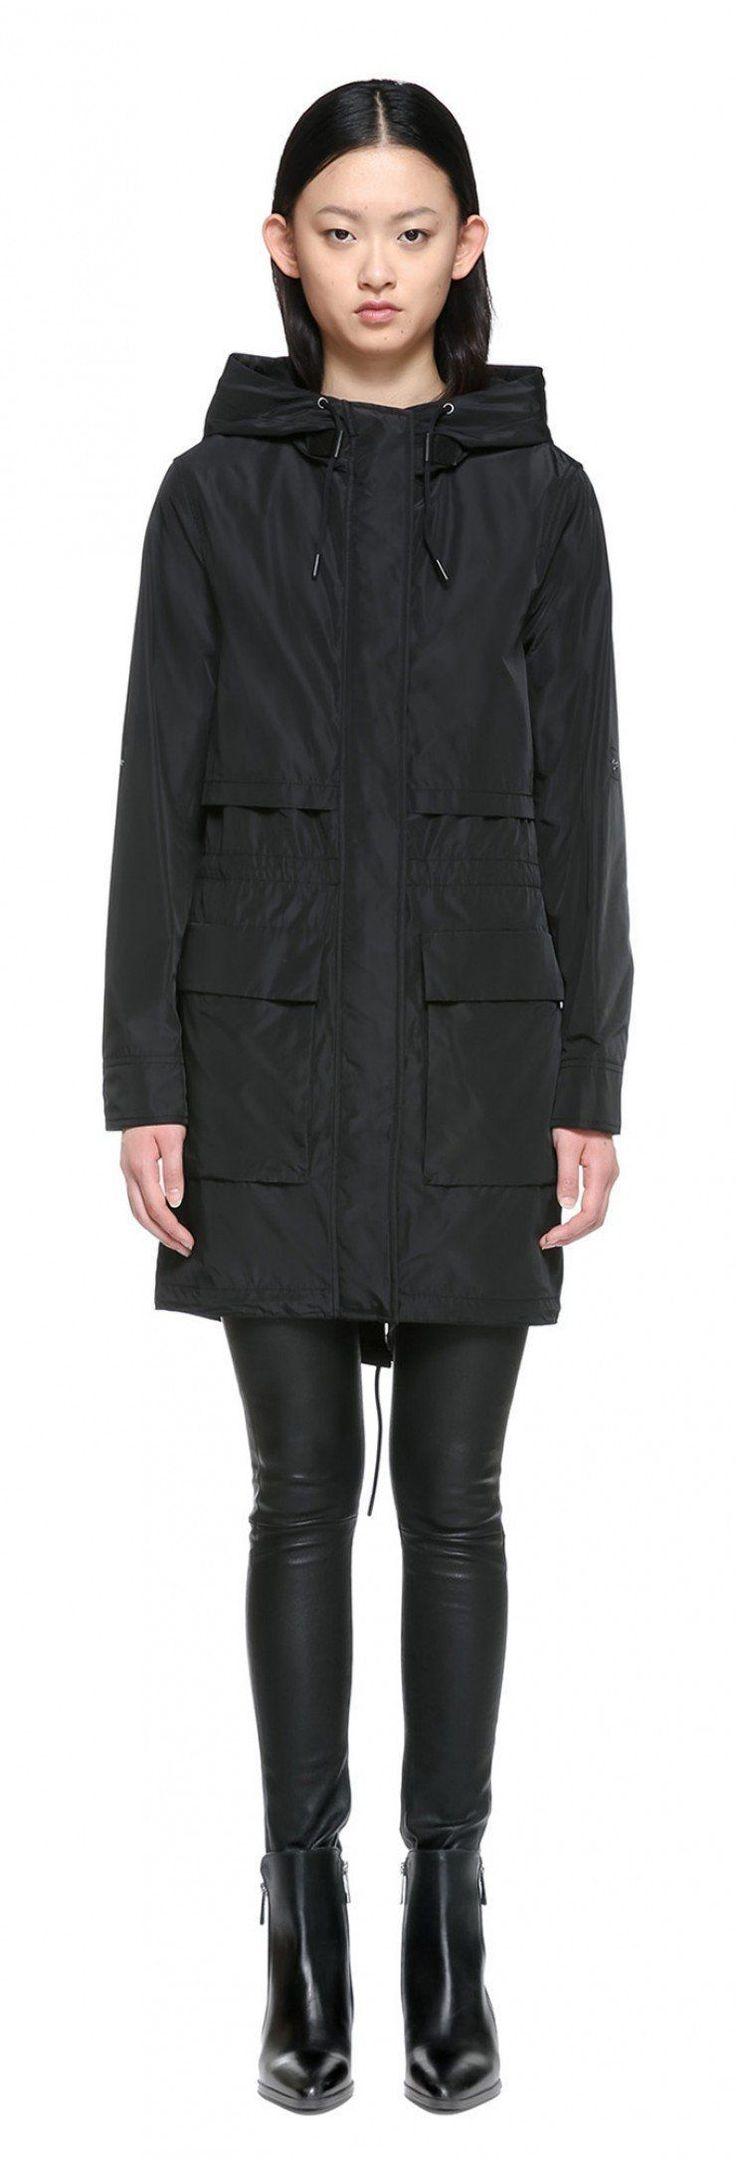 Mackage Cosima Fishtail Parka Raincoat with Hood in Black #RaincoatsForWomenHoods